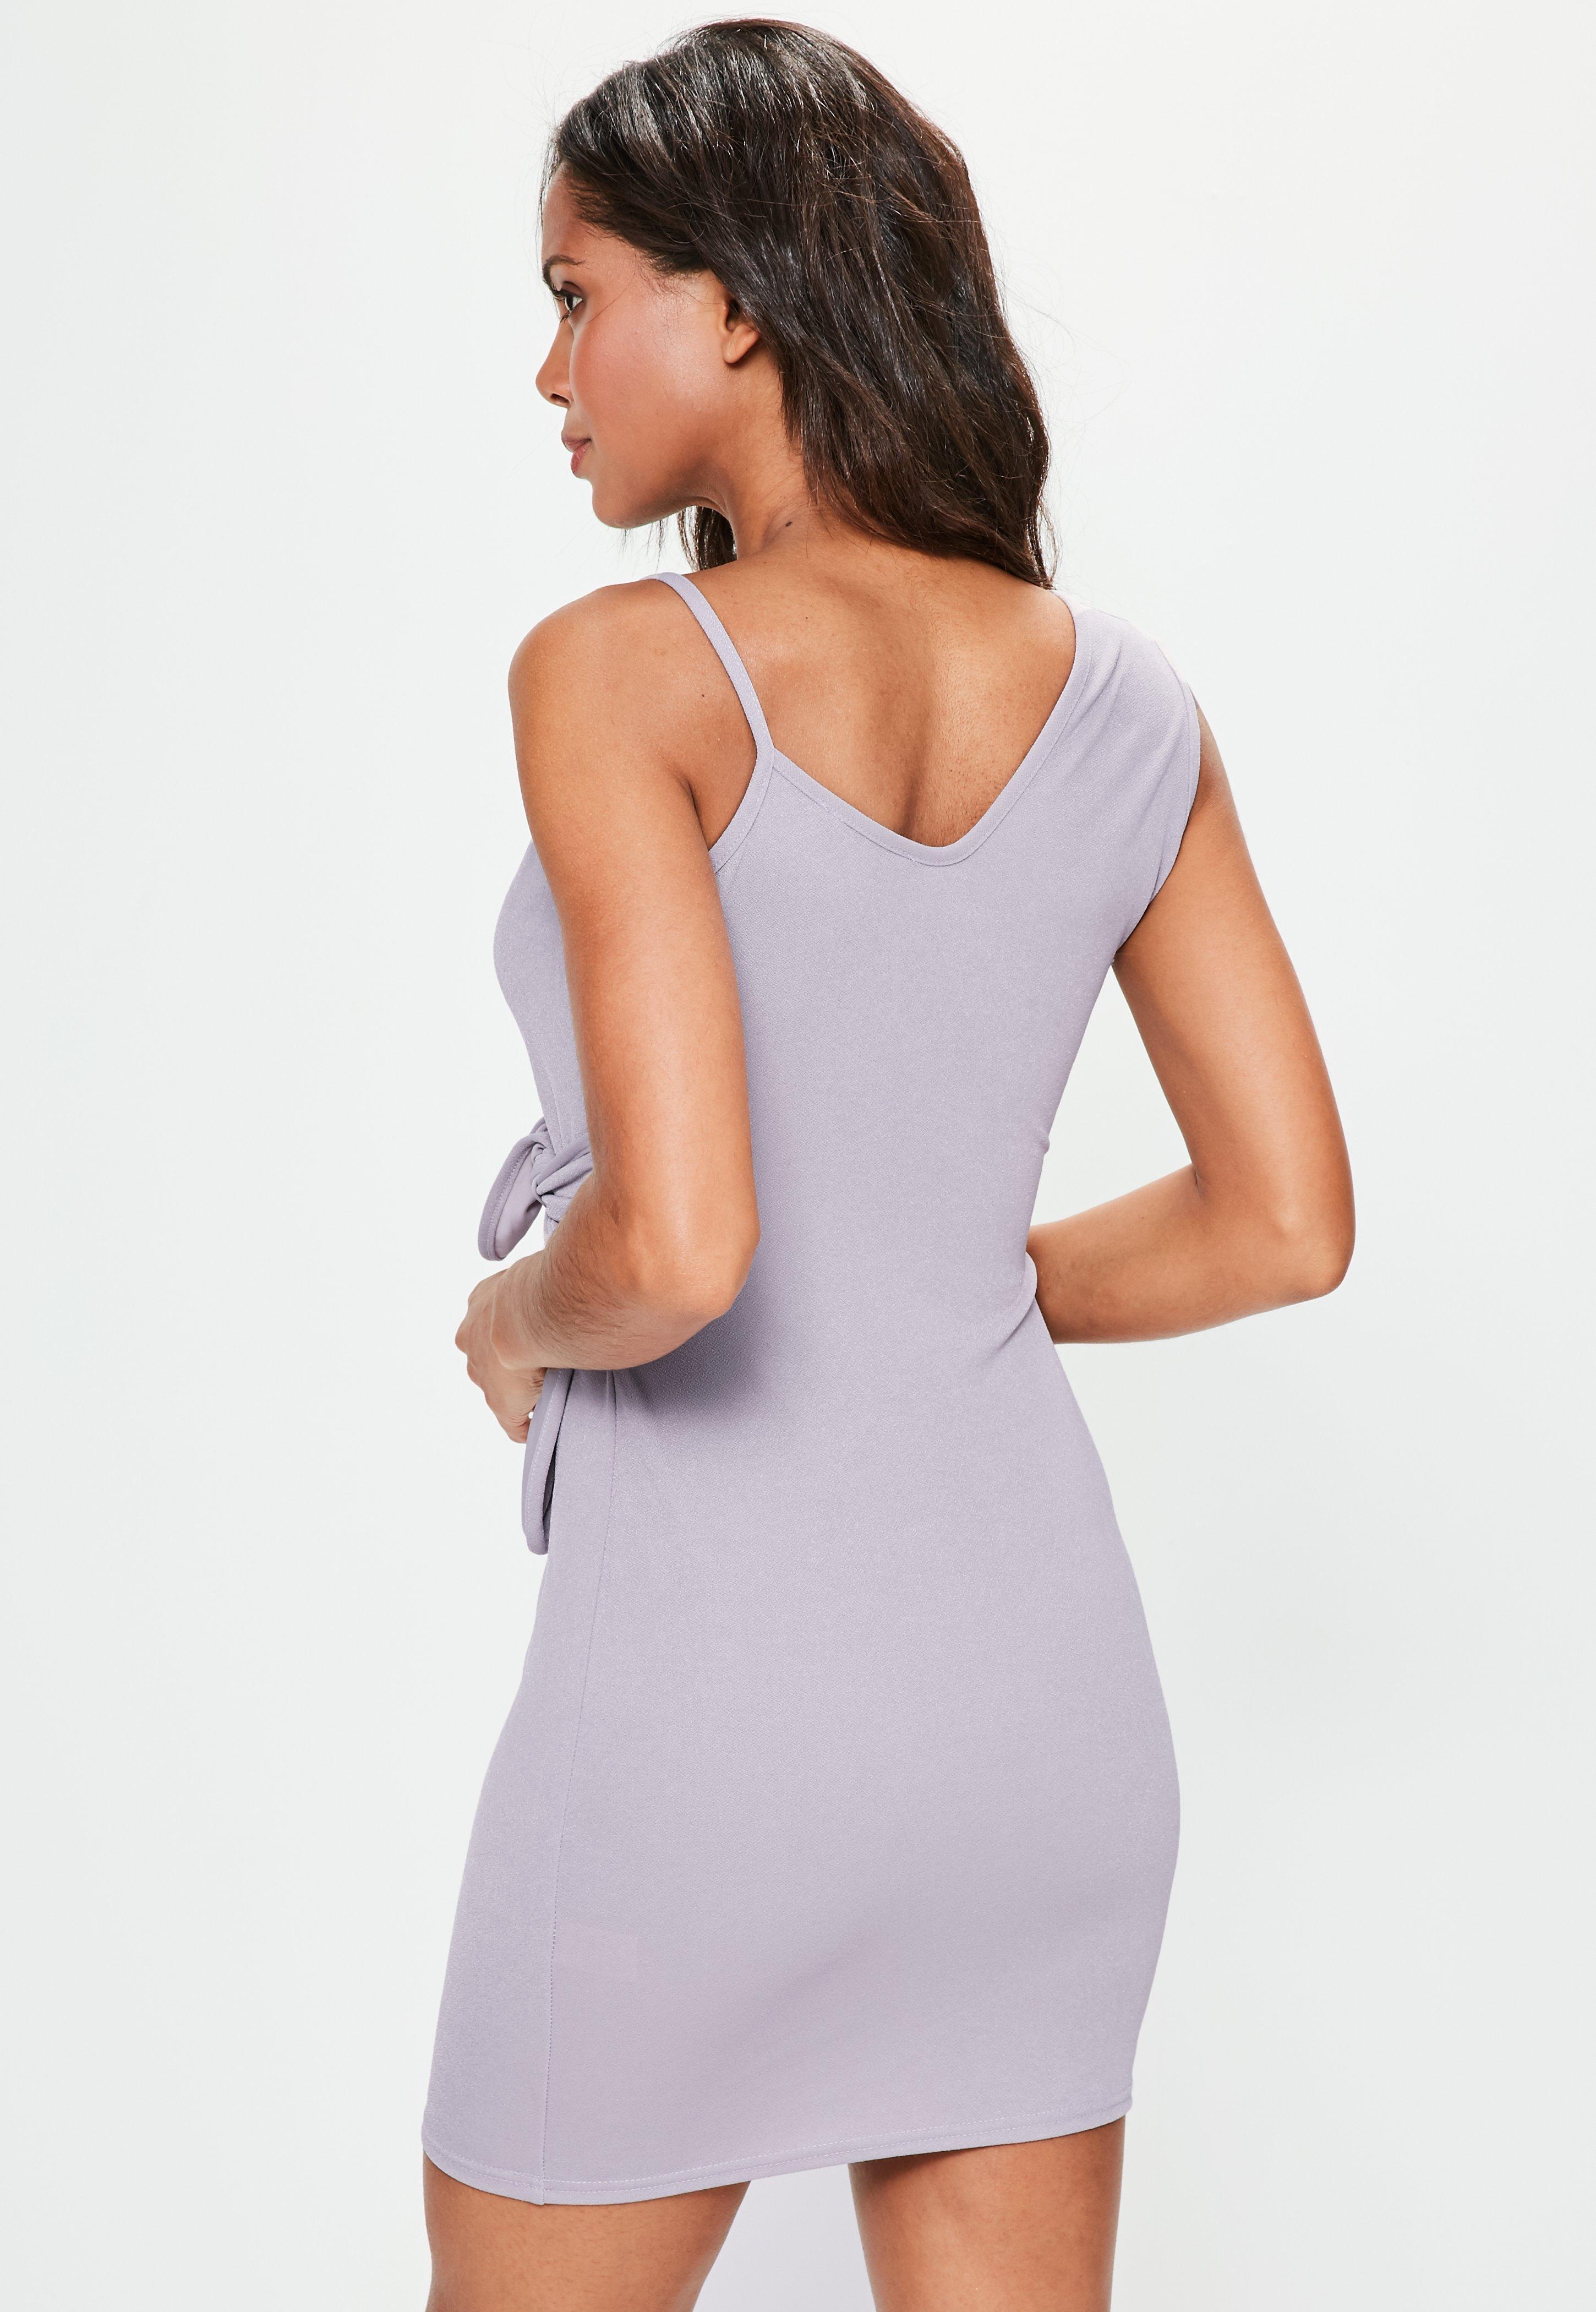 Lyst - Missguided Purple Plunge Wrap Tie Detail Bodycon Dress in Purple 165b4e5e3